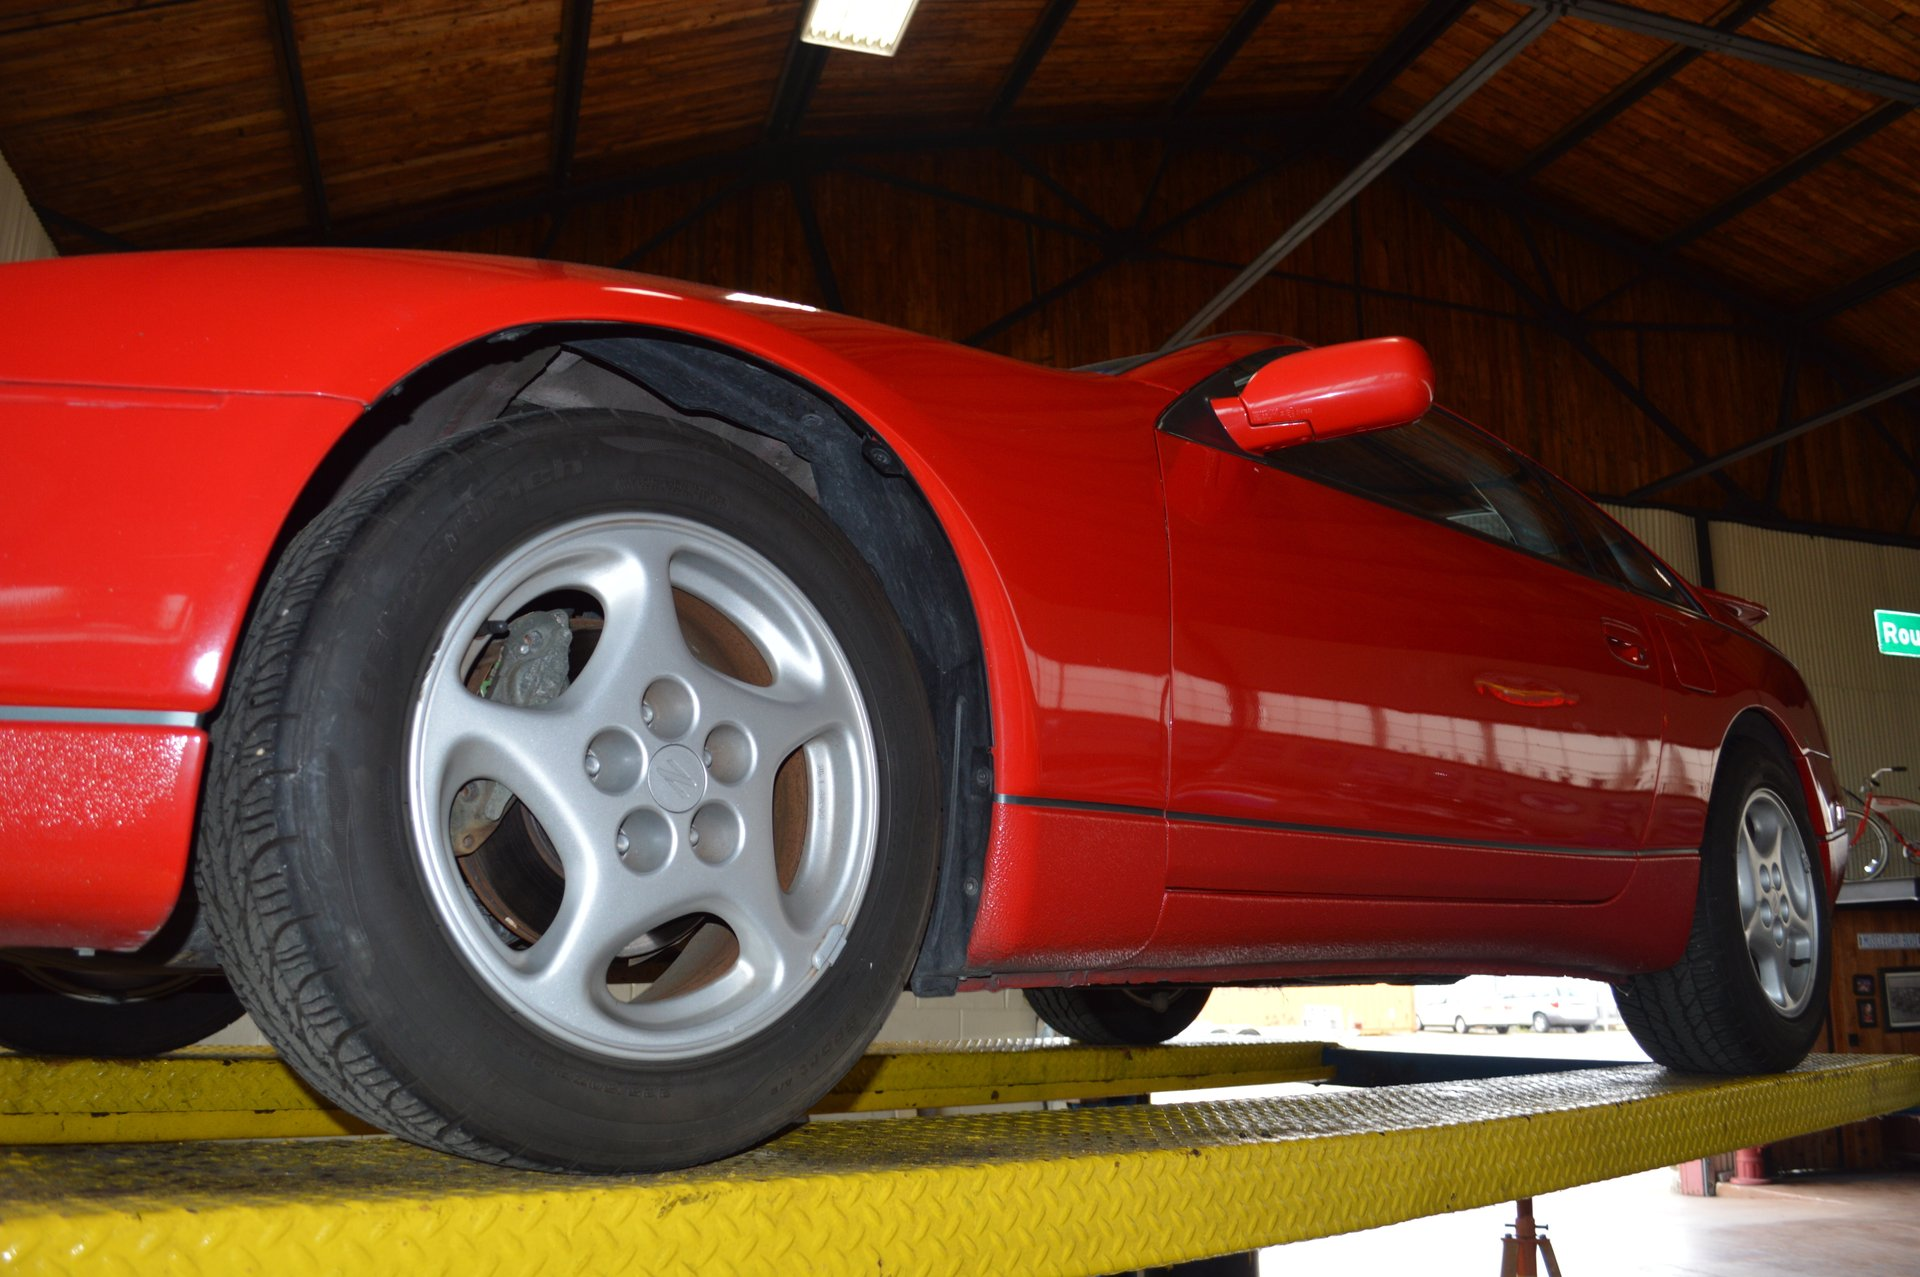 1996 Nissan 300ZX Twin Turbo | Frank's Car Barn